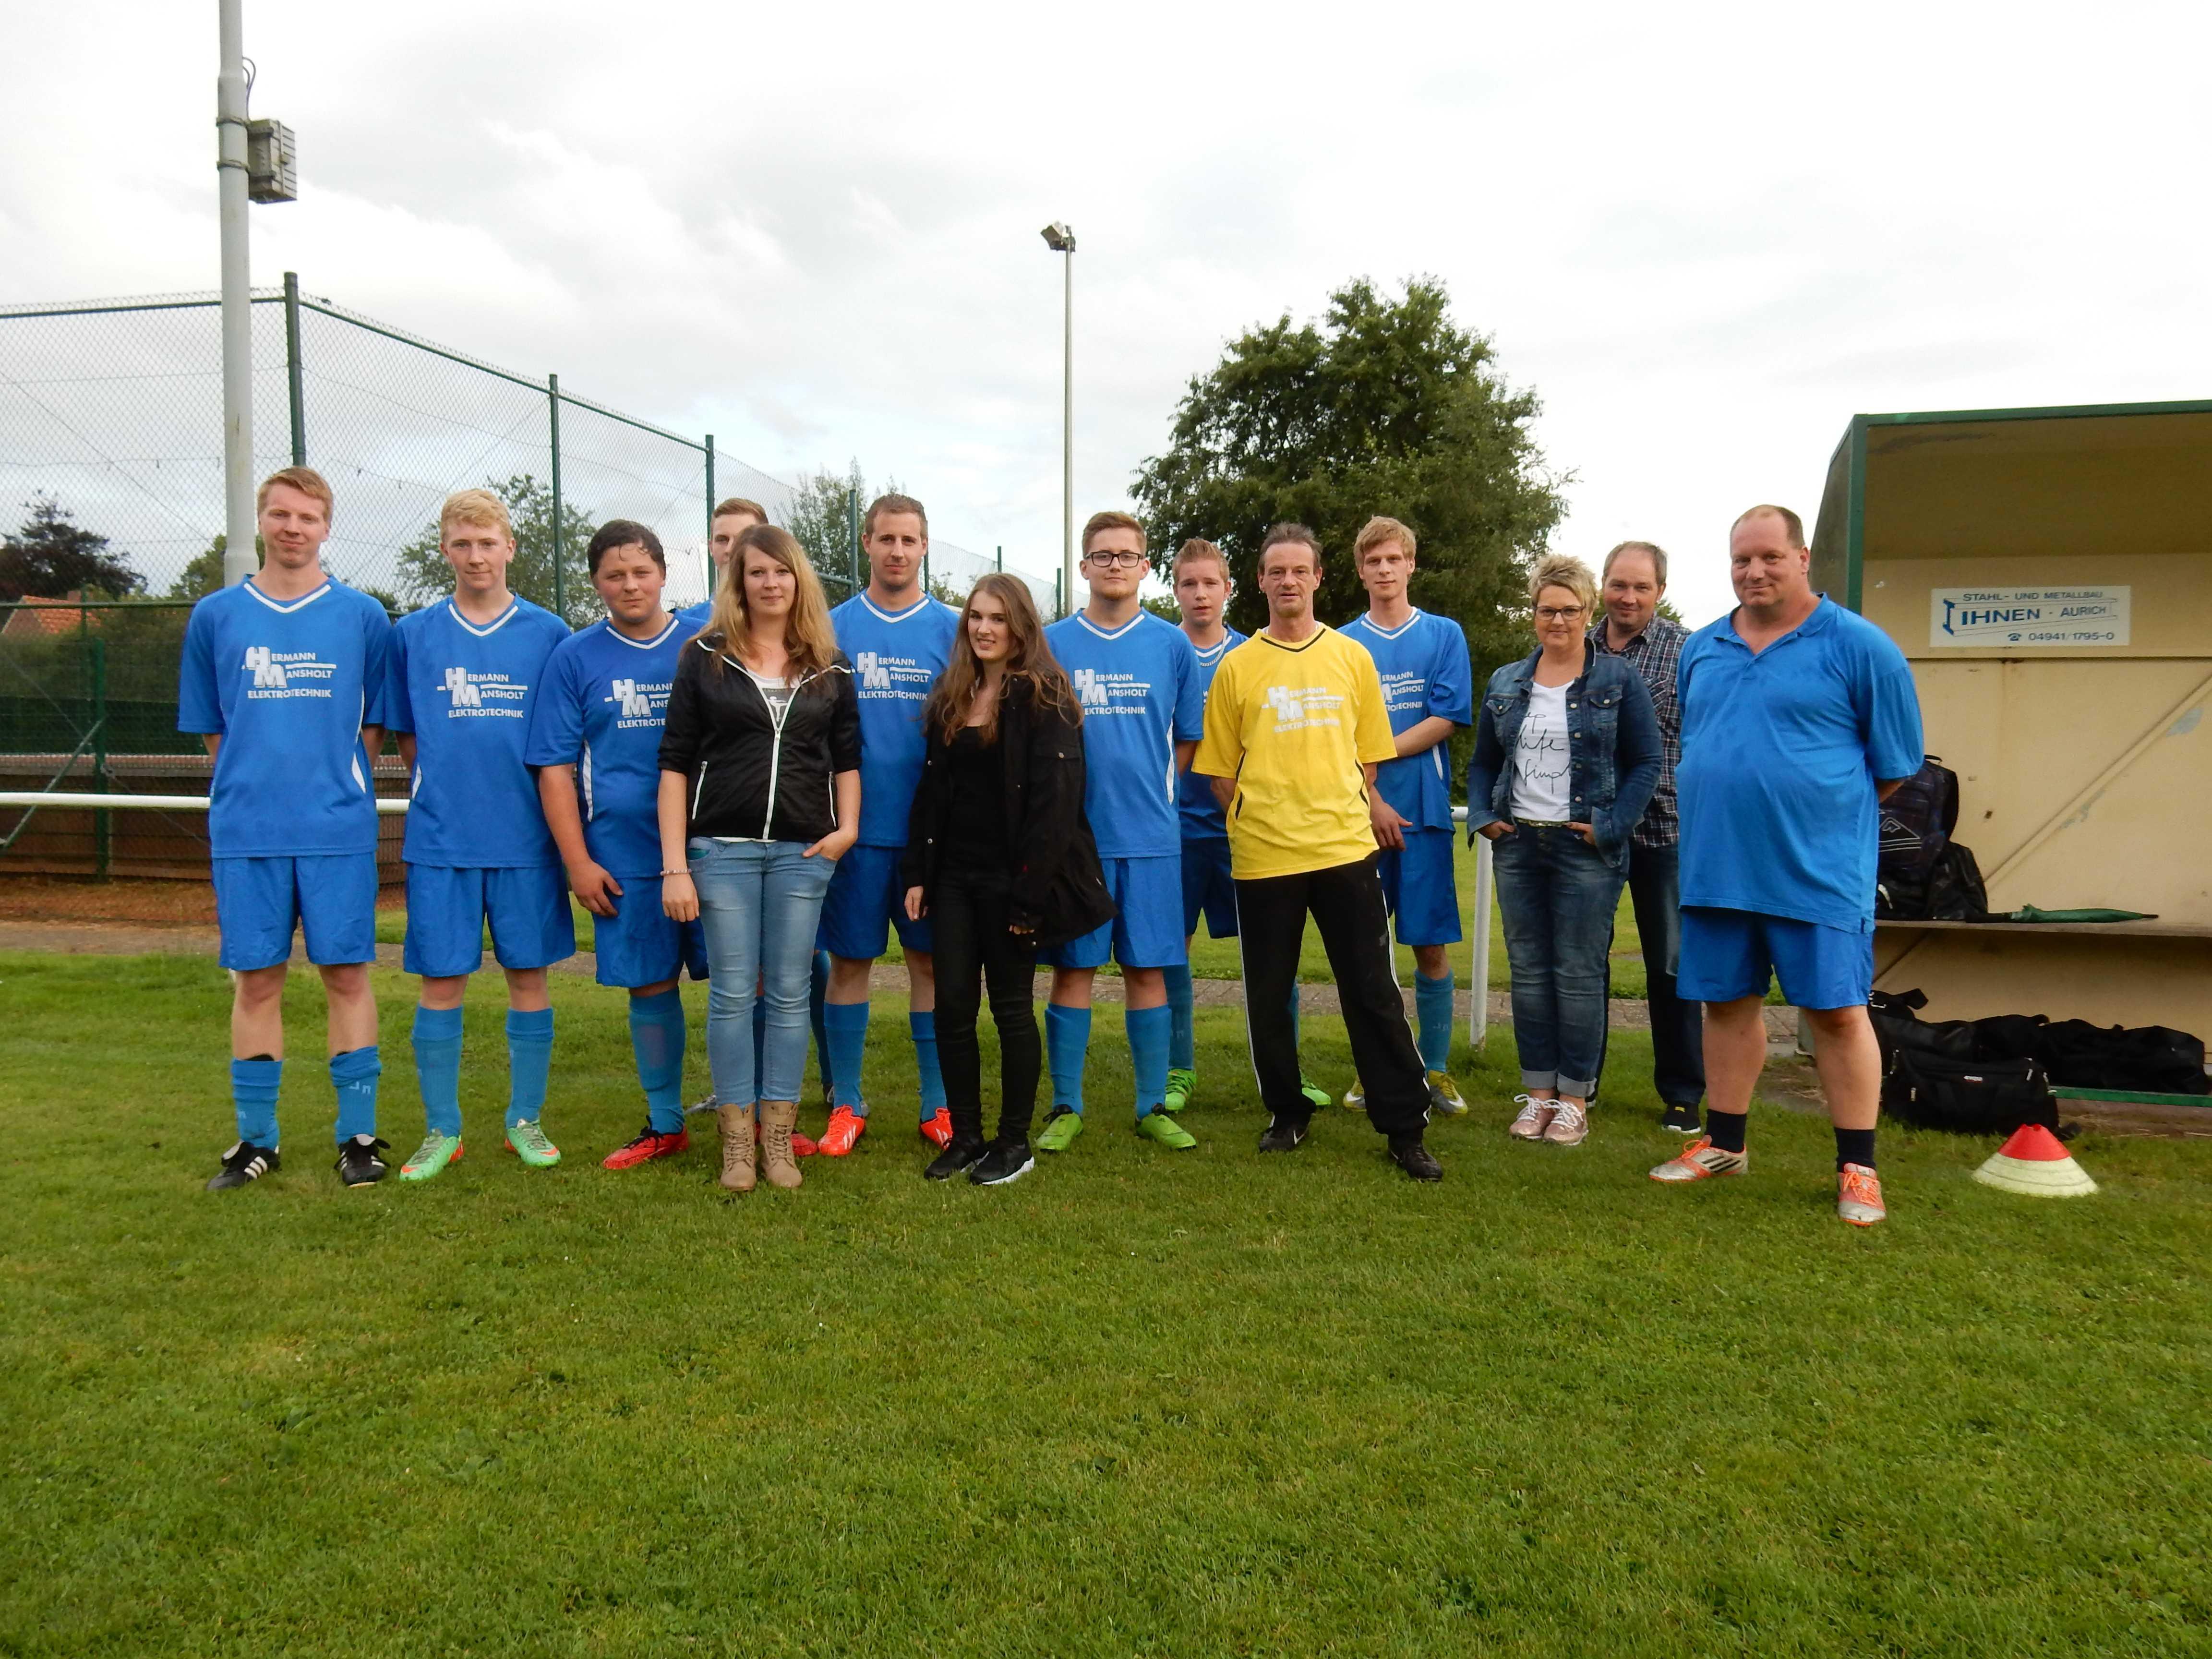 2016-07-29 Sportwoche - erster Freitag (17)